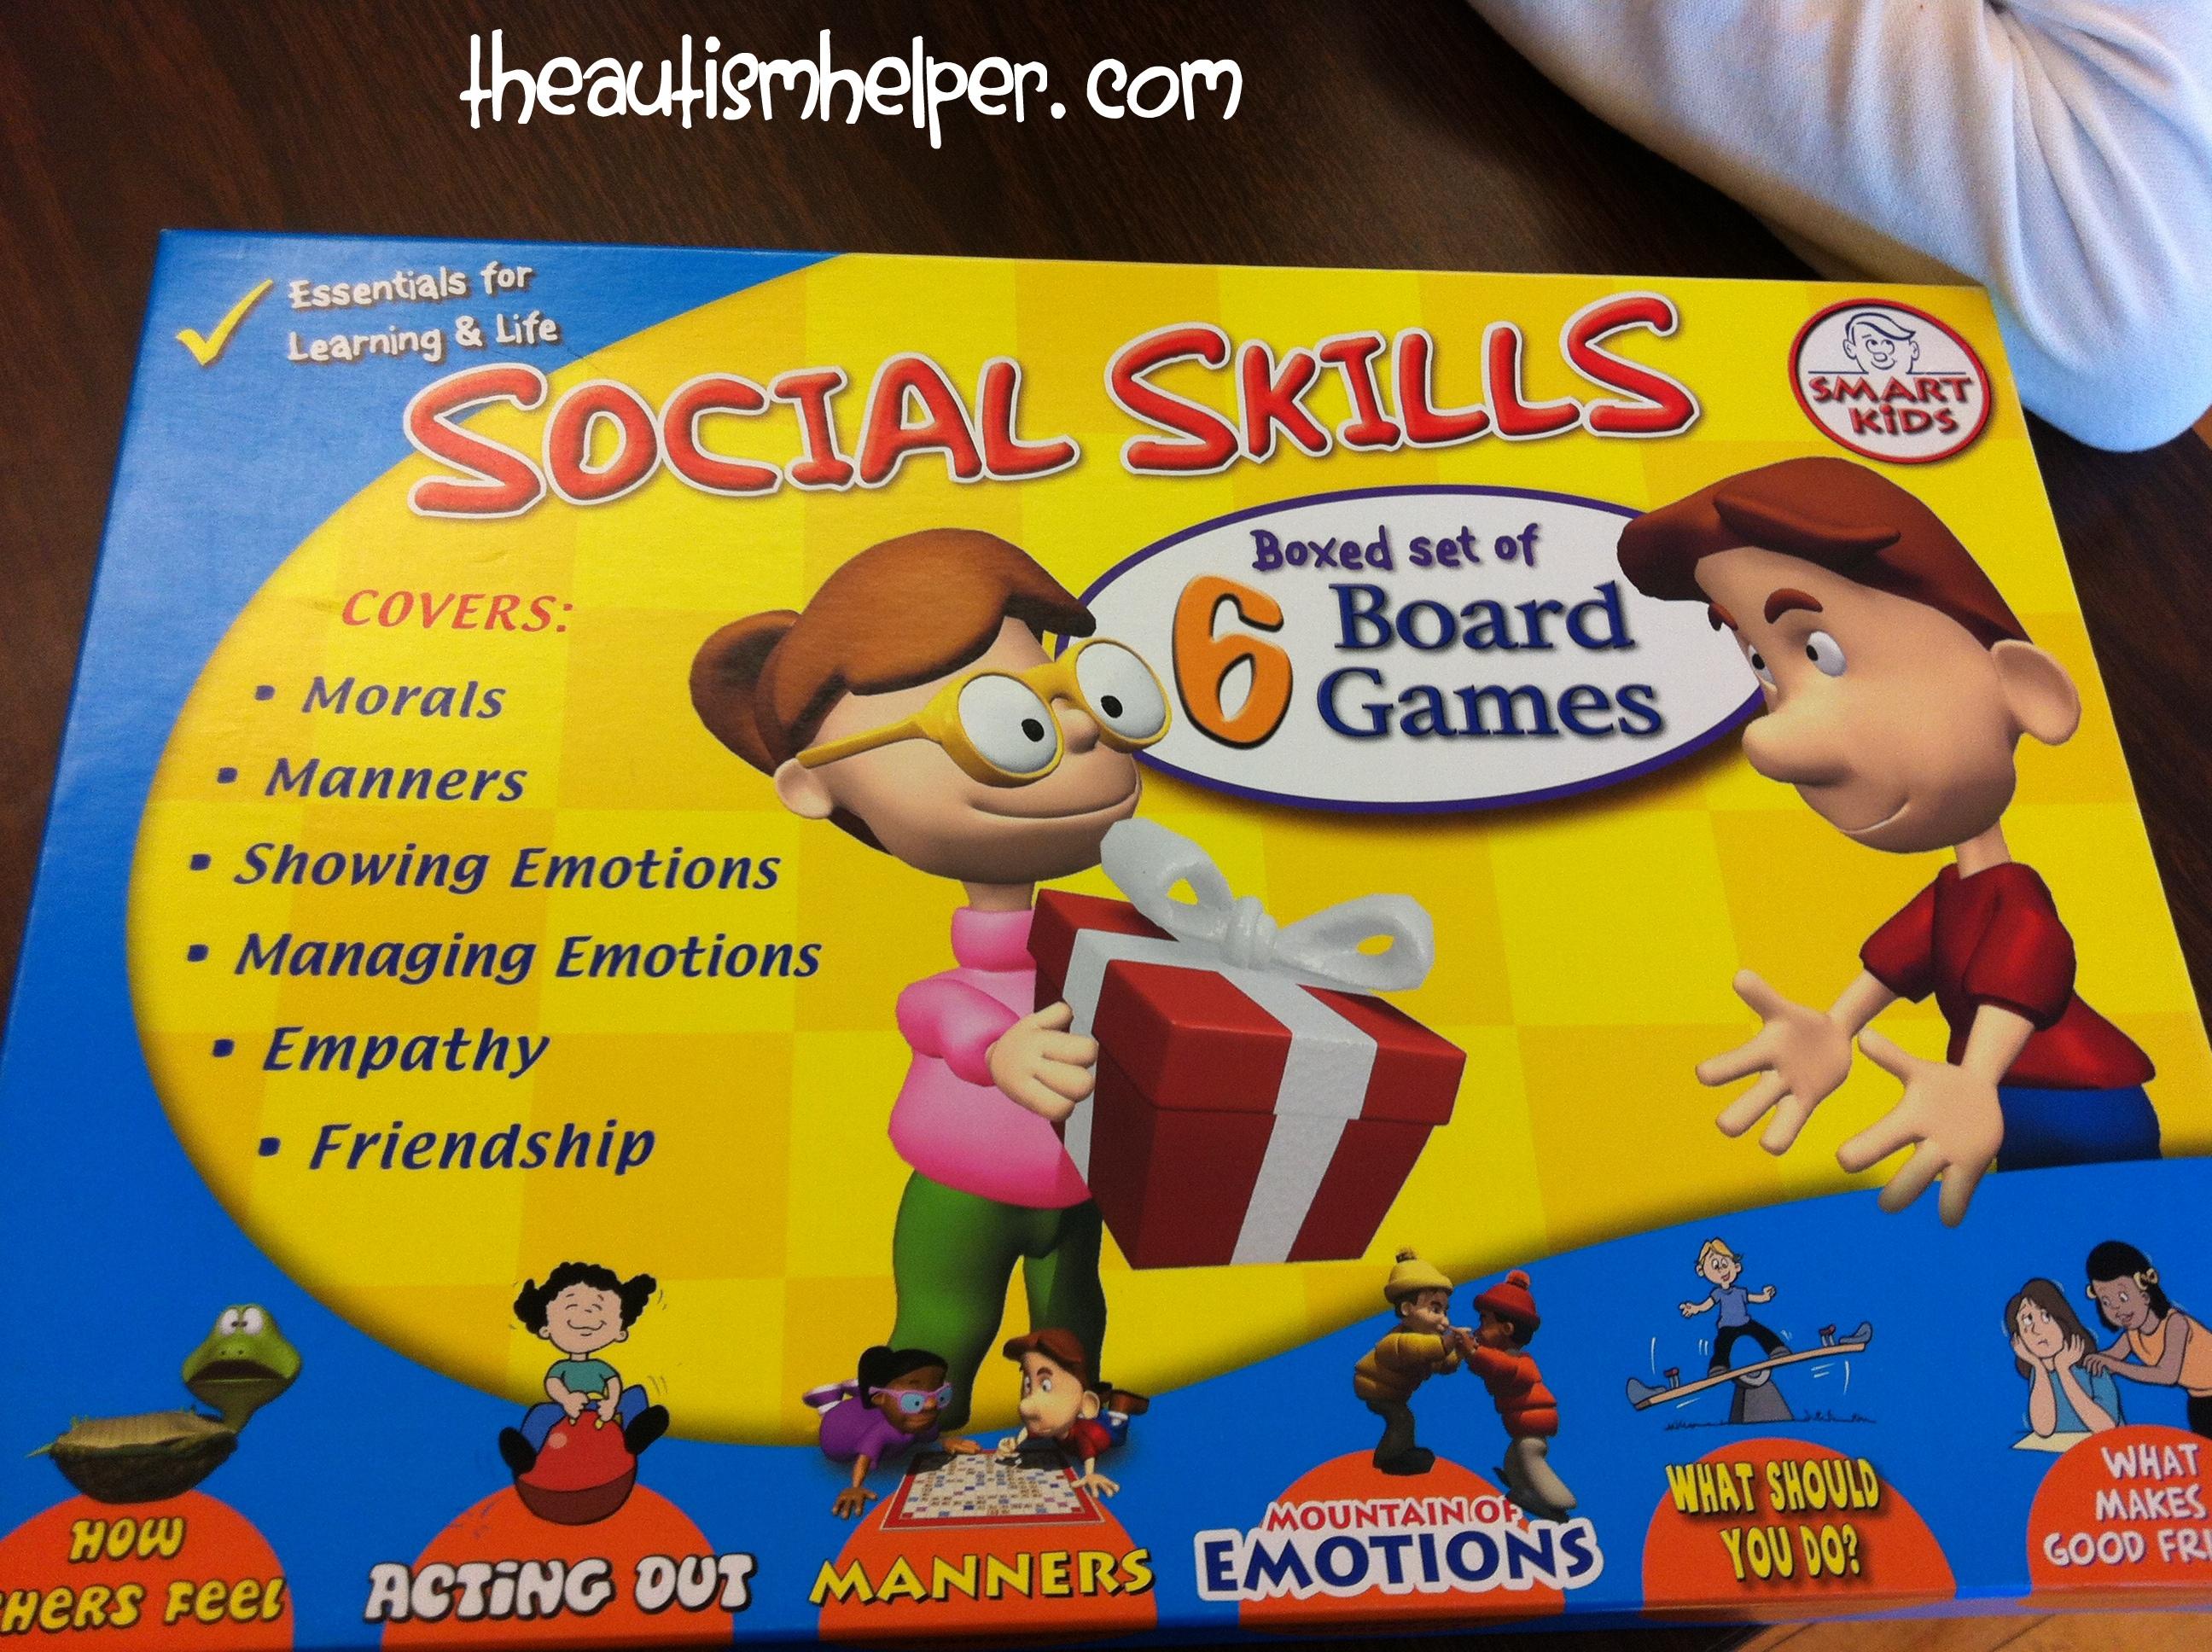 More Great Social Skill Games